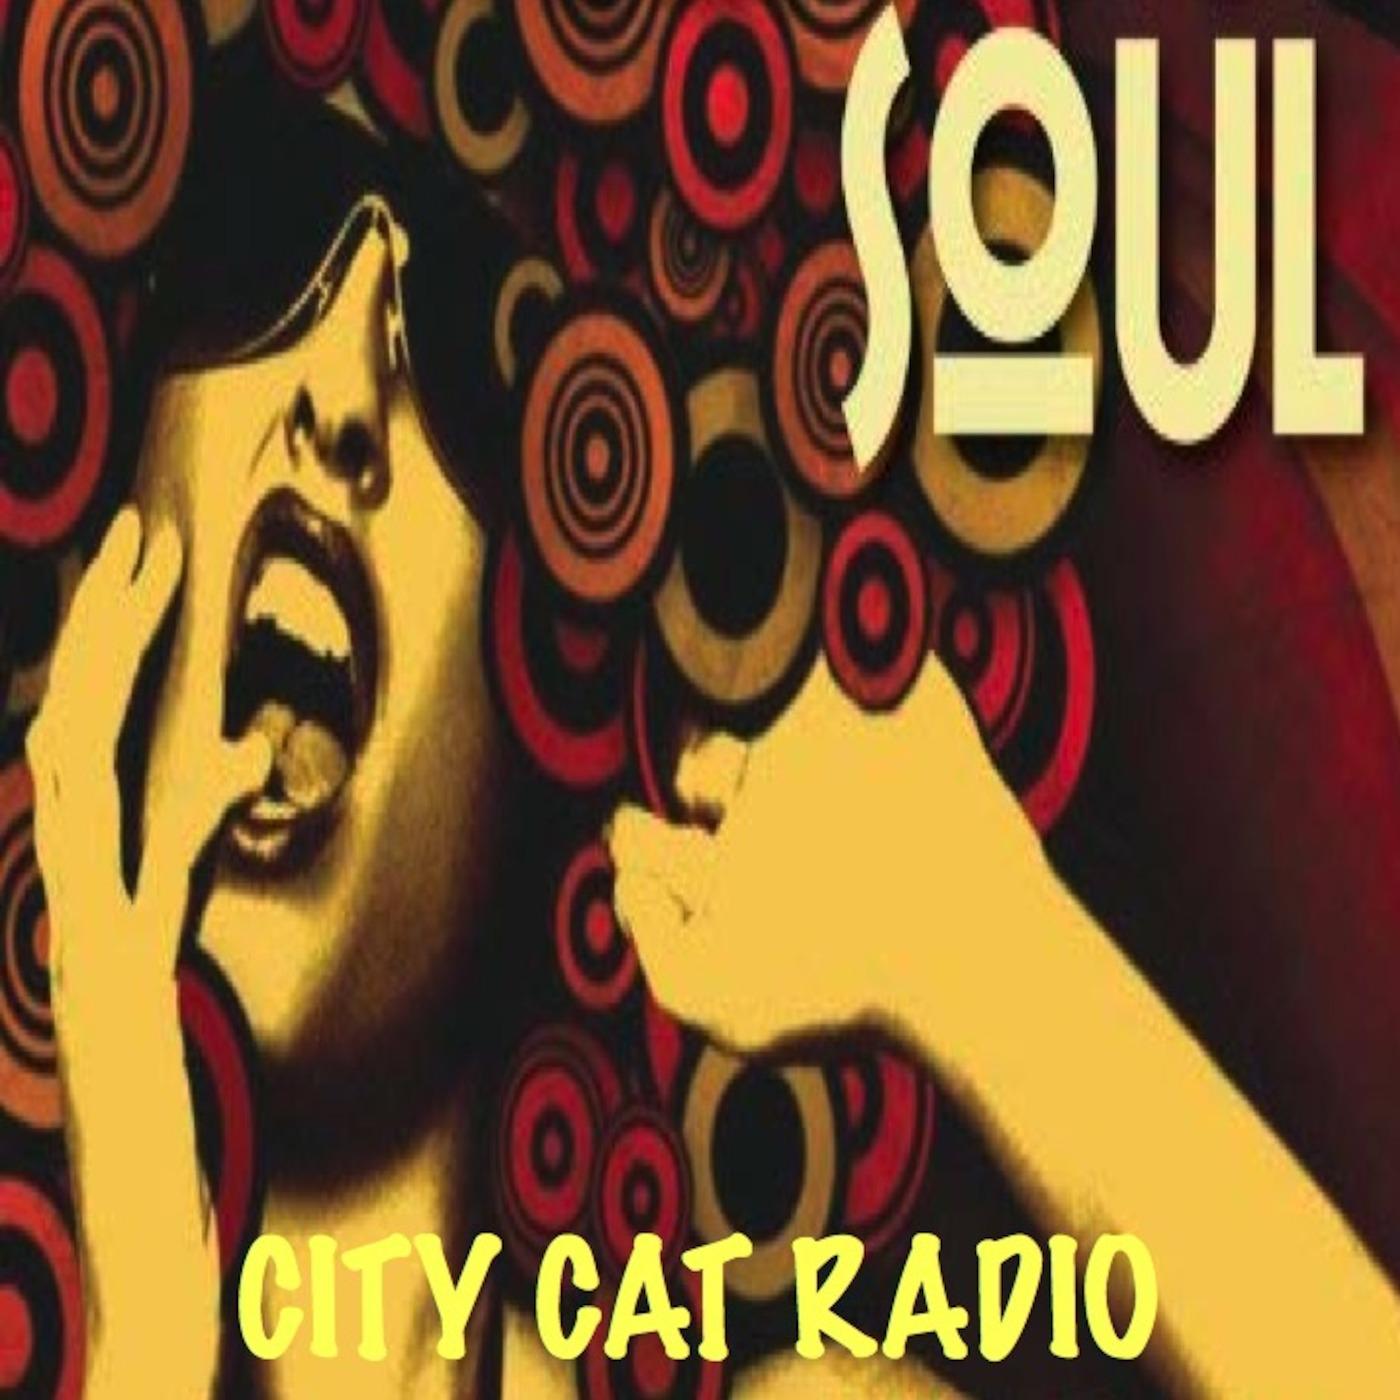 CITY CAT RADIO - ARIS INTERVIEW CITY CAT RADIO podcast